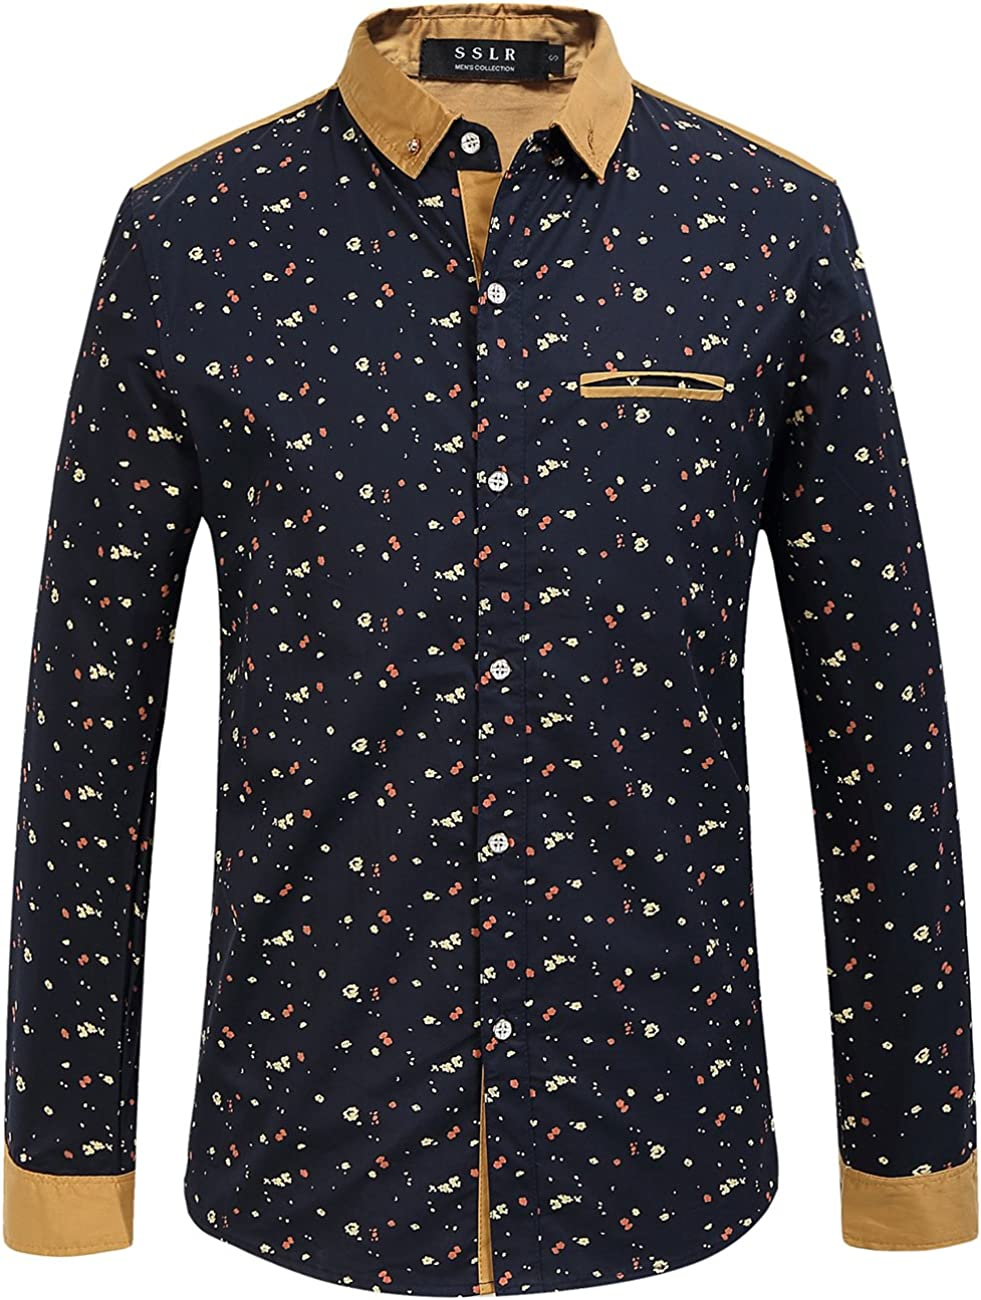 Men/'s 100/% Cotton Long Sleeve Casual Shirts Slim Fit Button Down Dress Shirts GW